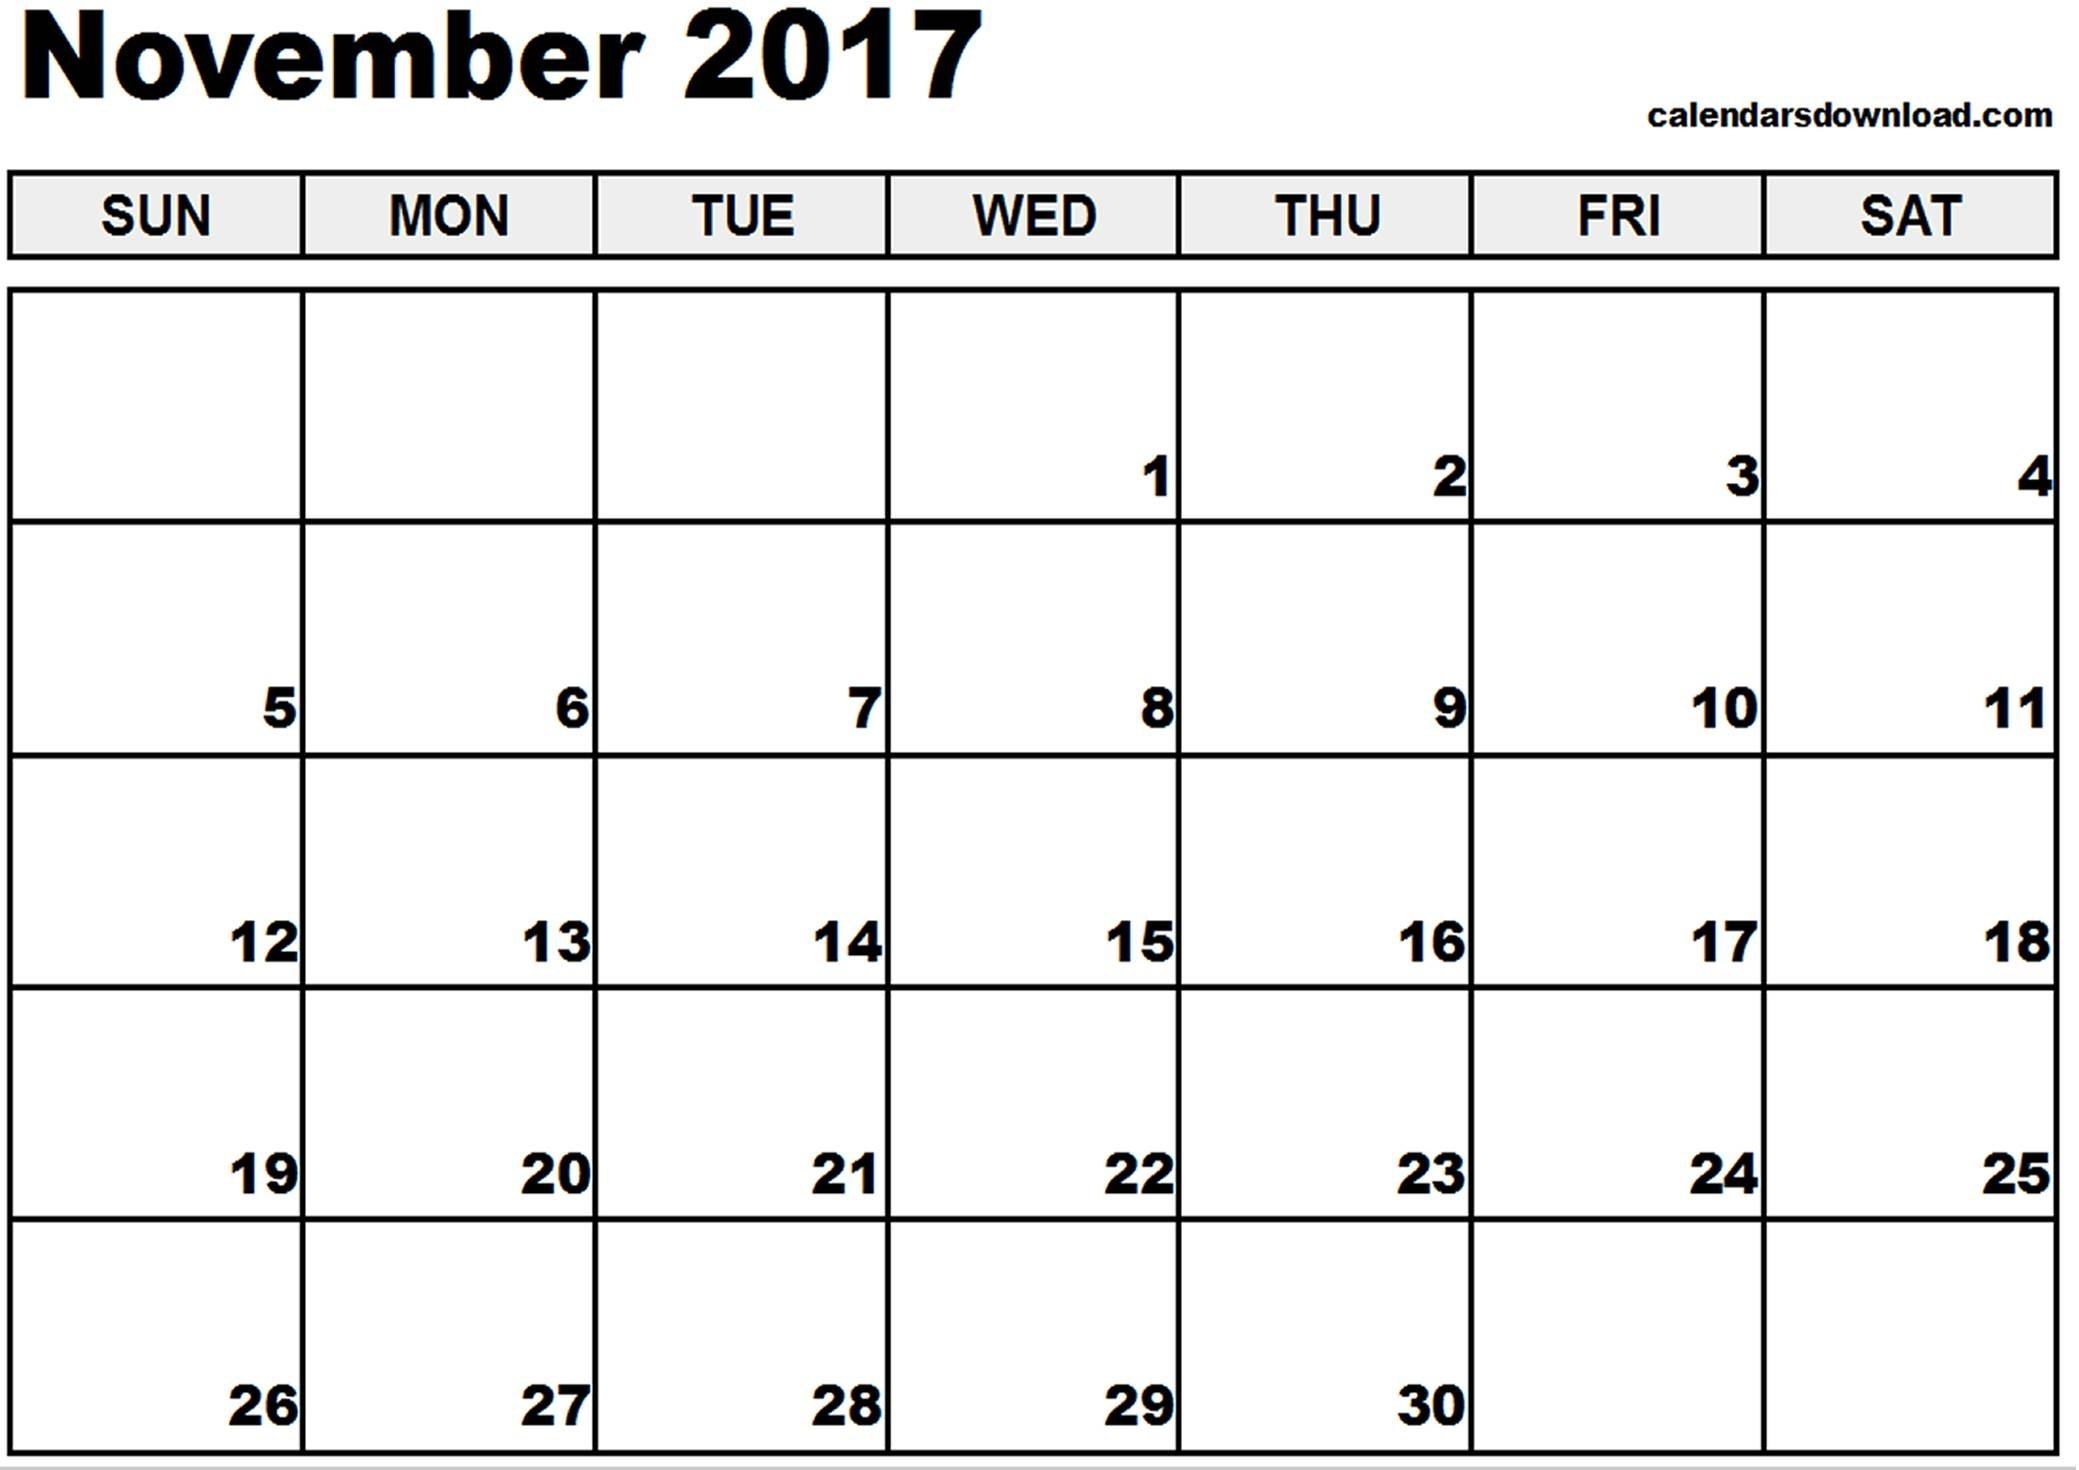 November 2017 Calendar Printable | Templates Free Printable regarding Nov Dec 2017 Calendar Printable